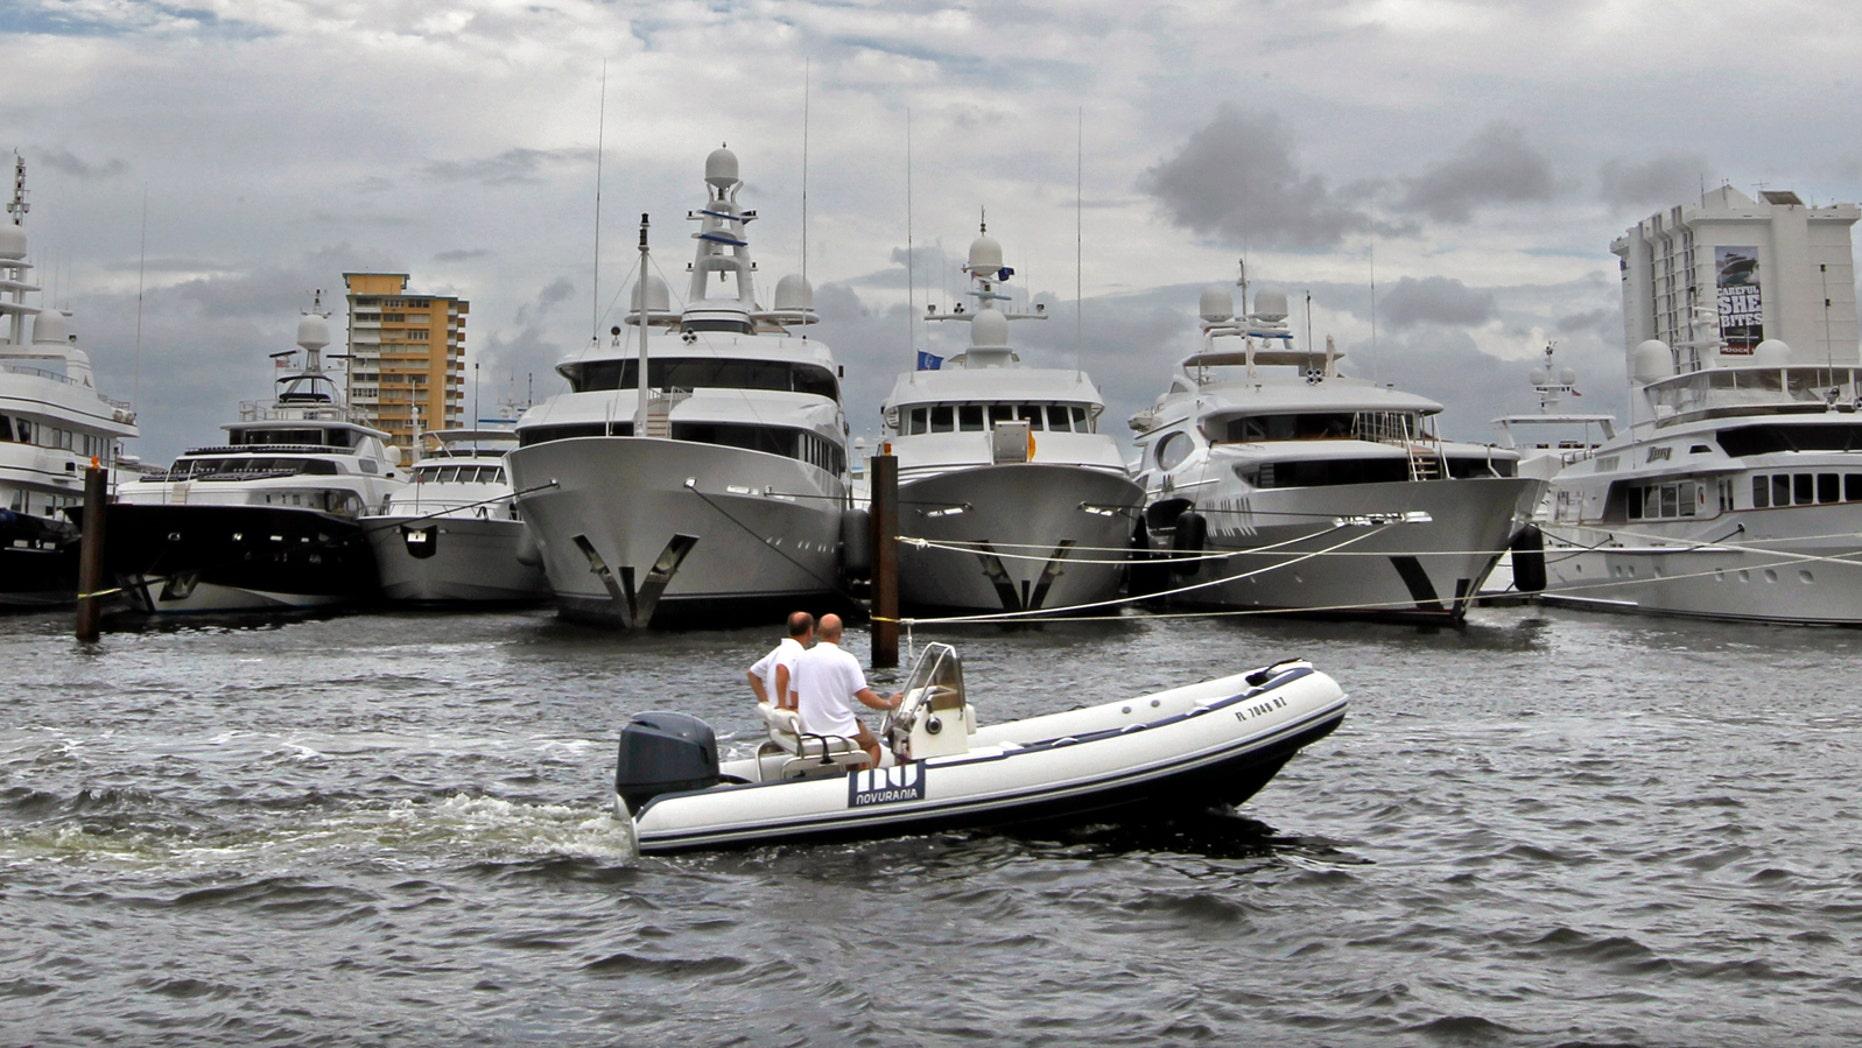 (AP Photo/The Miami Herald,Charles Trainor Jr.)